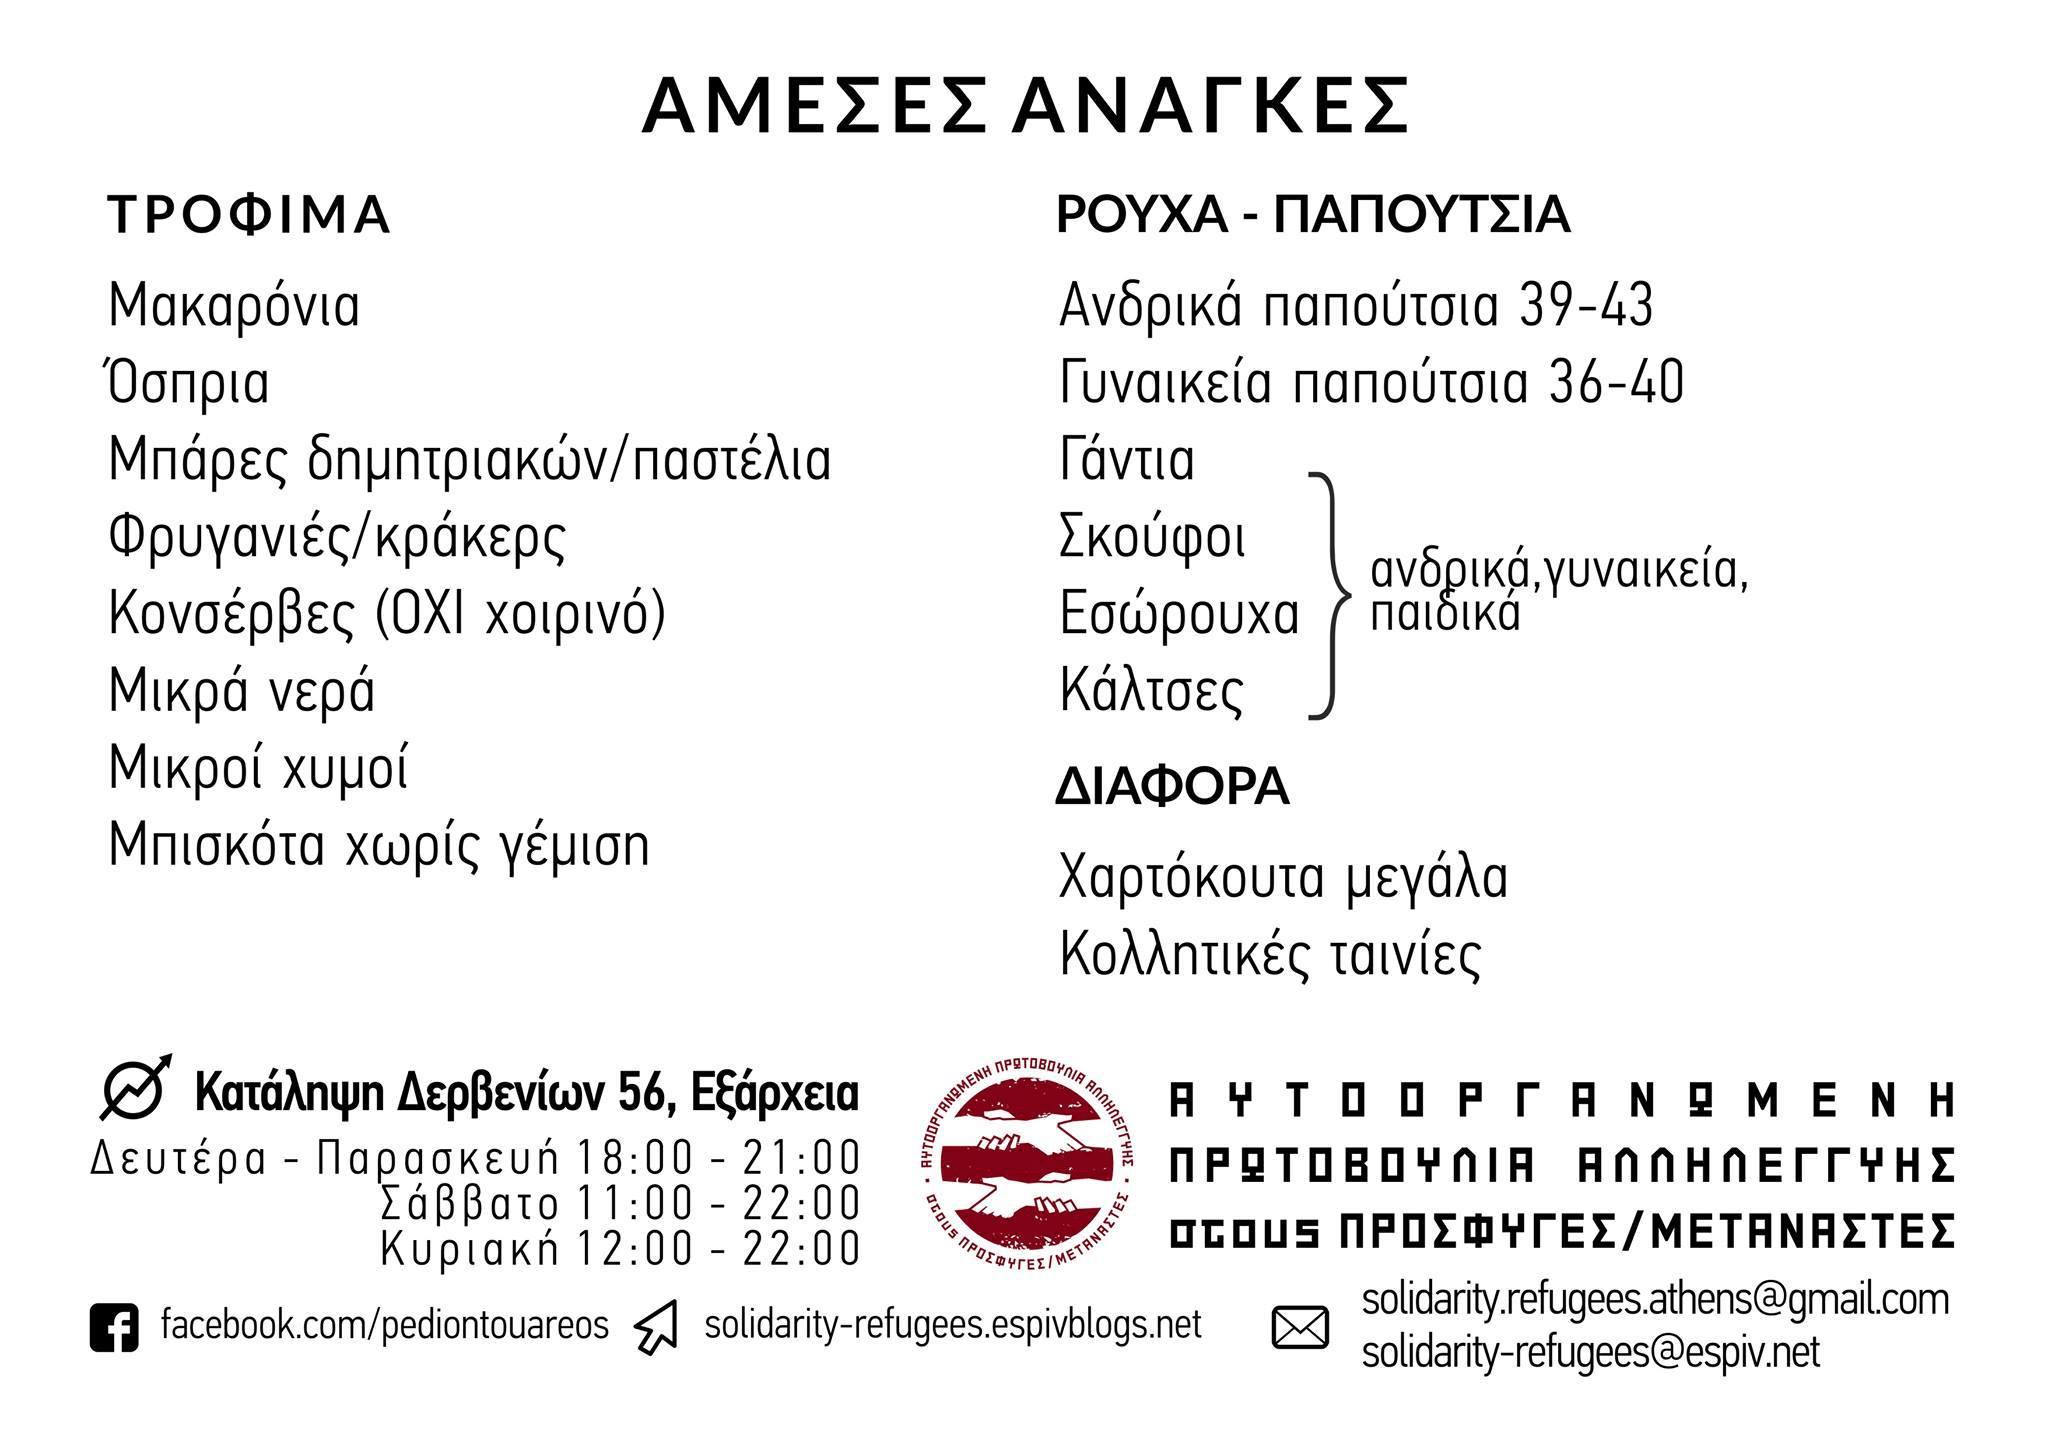 anagkes-derv-prosf-01